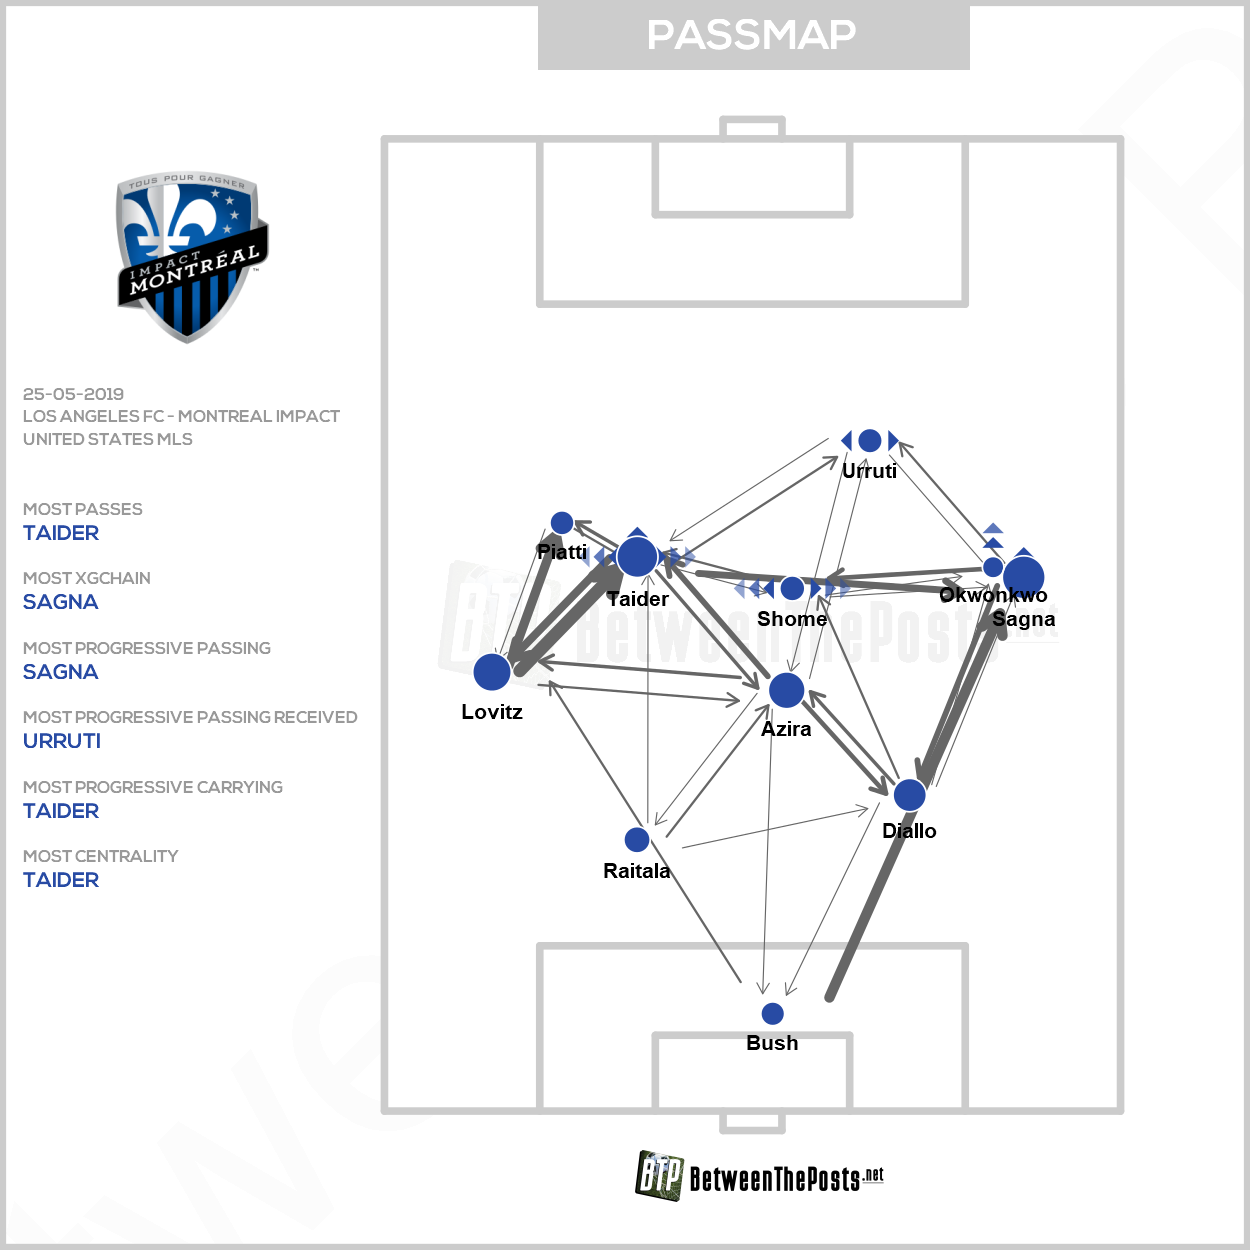 Passmap Los Angeles FC Montreal Impact 4-2 MLS